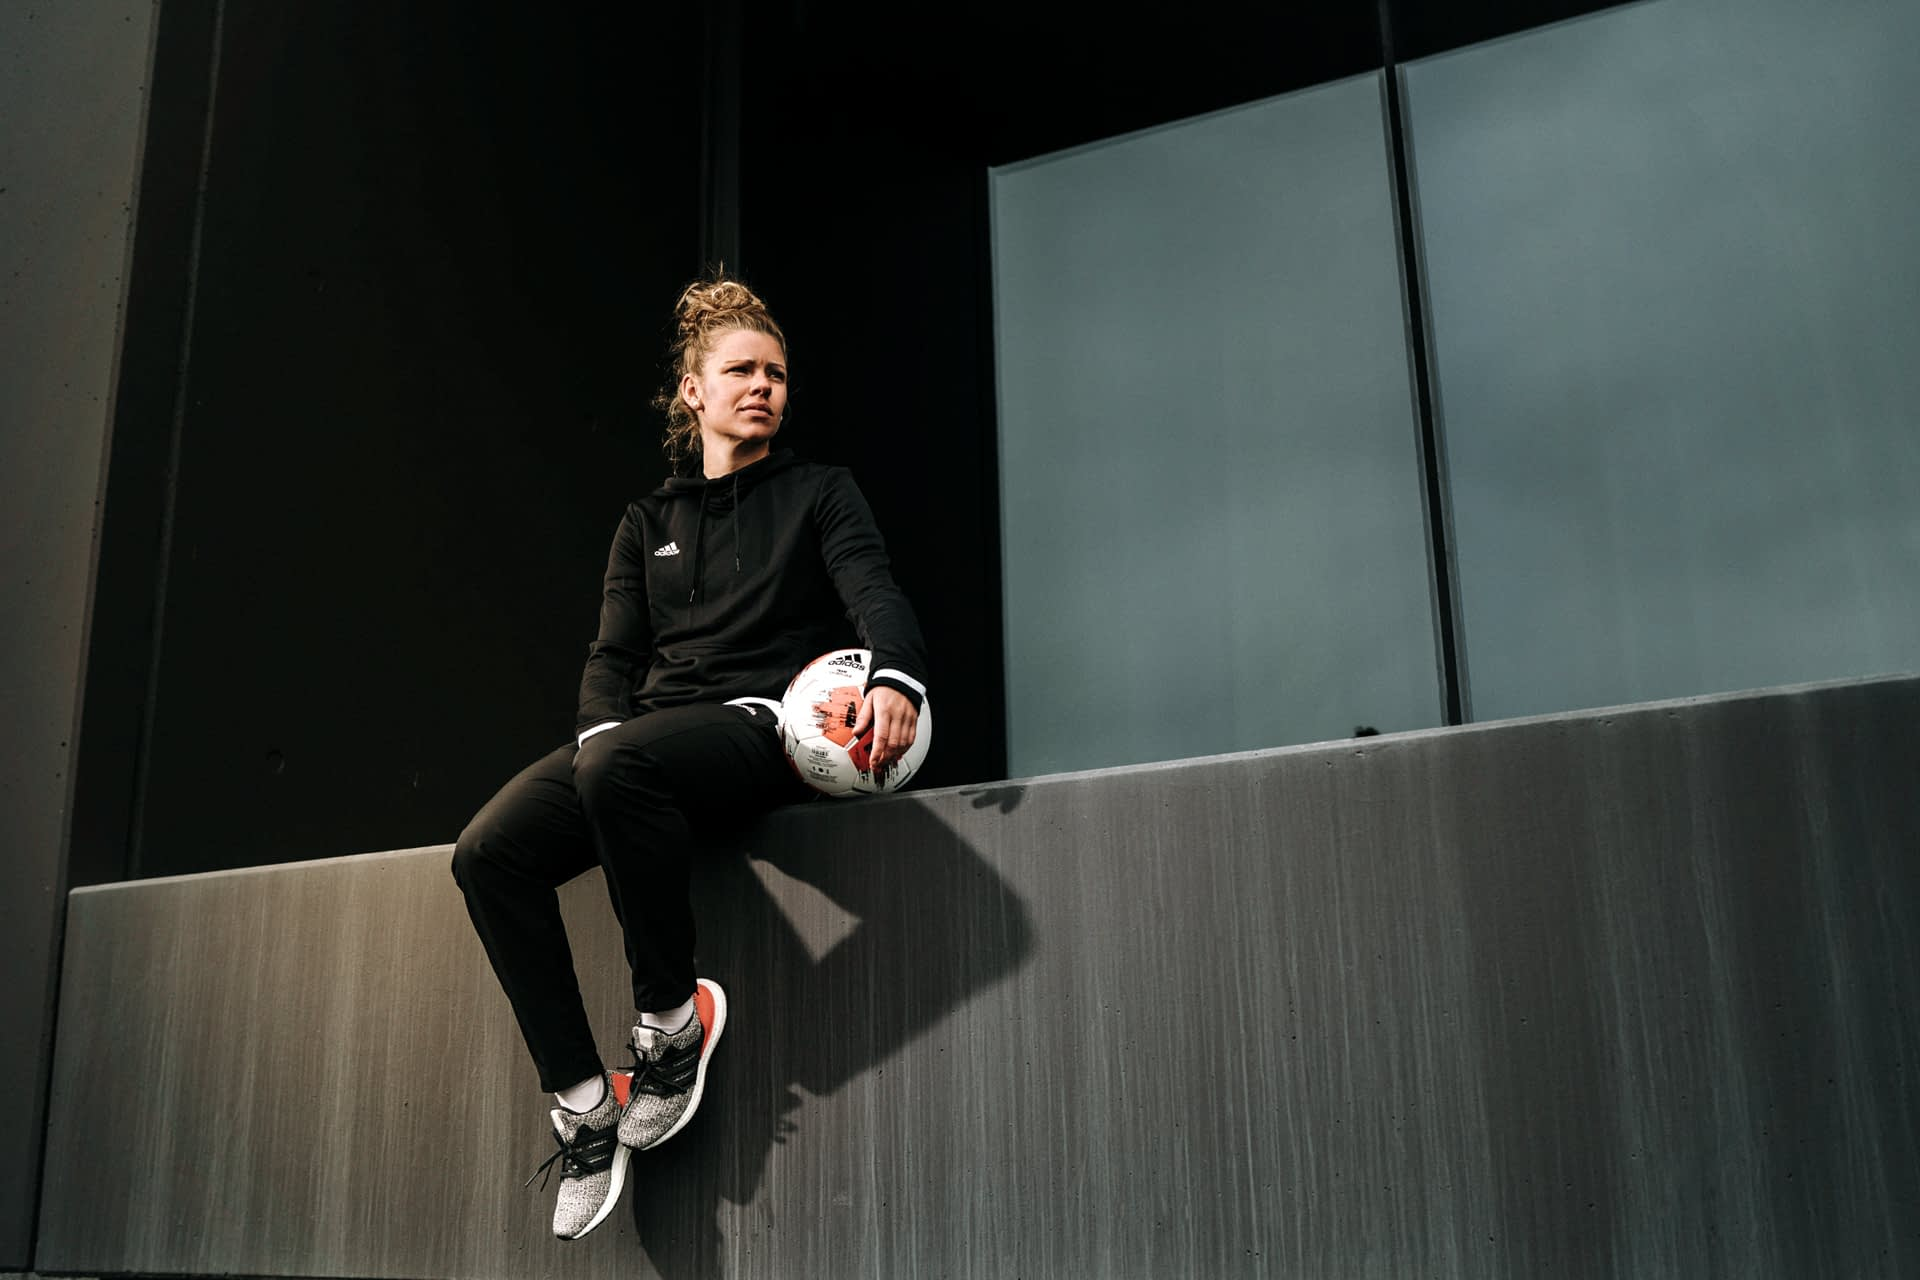 Linda-Dallmann-DFB-FCB-Portrait-Fotograf-München-04